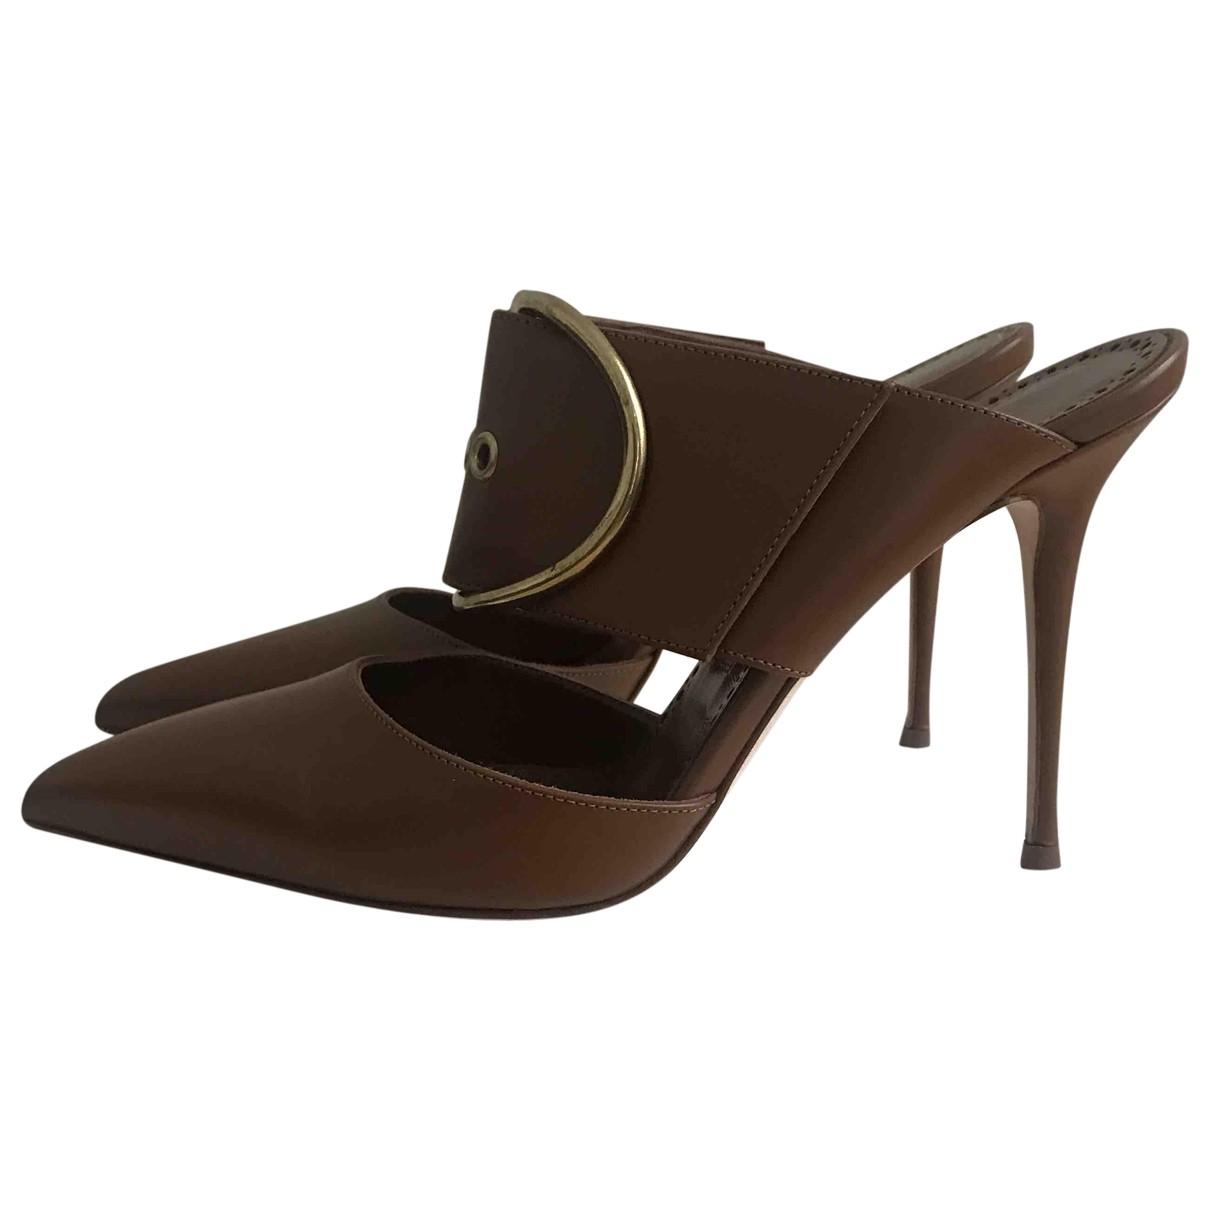 Manolo Blahnik \N Brown Leather Sandals for Women 37 EU